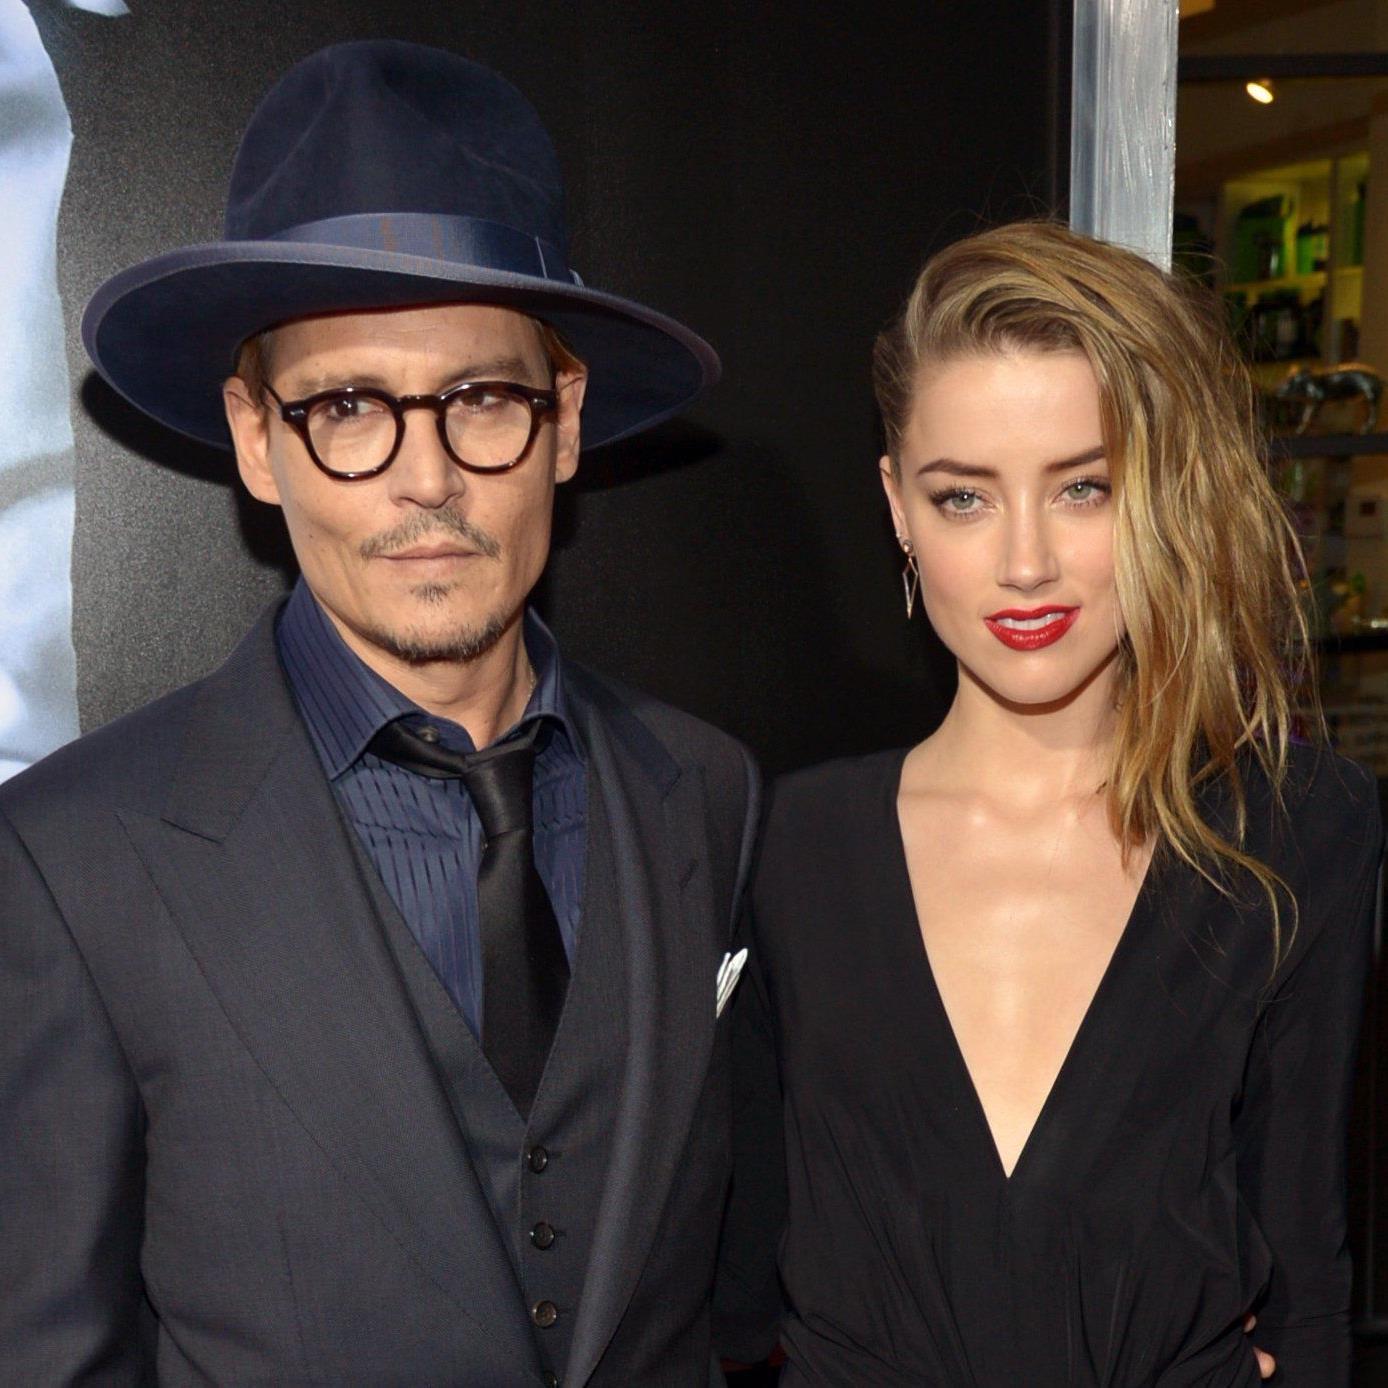 Johnny Depp ist nun offiziell vom Markt - laut Medienberichten hat er Freundin Amber Heard geheiratet.